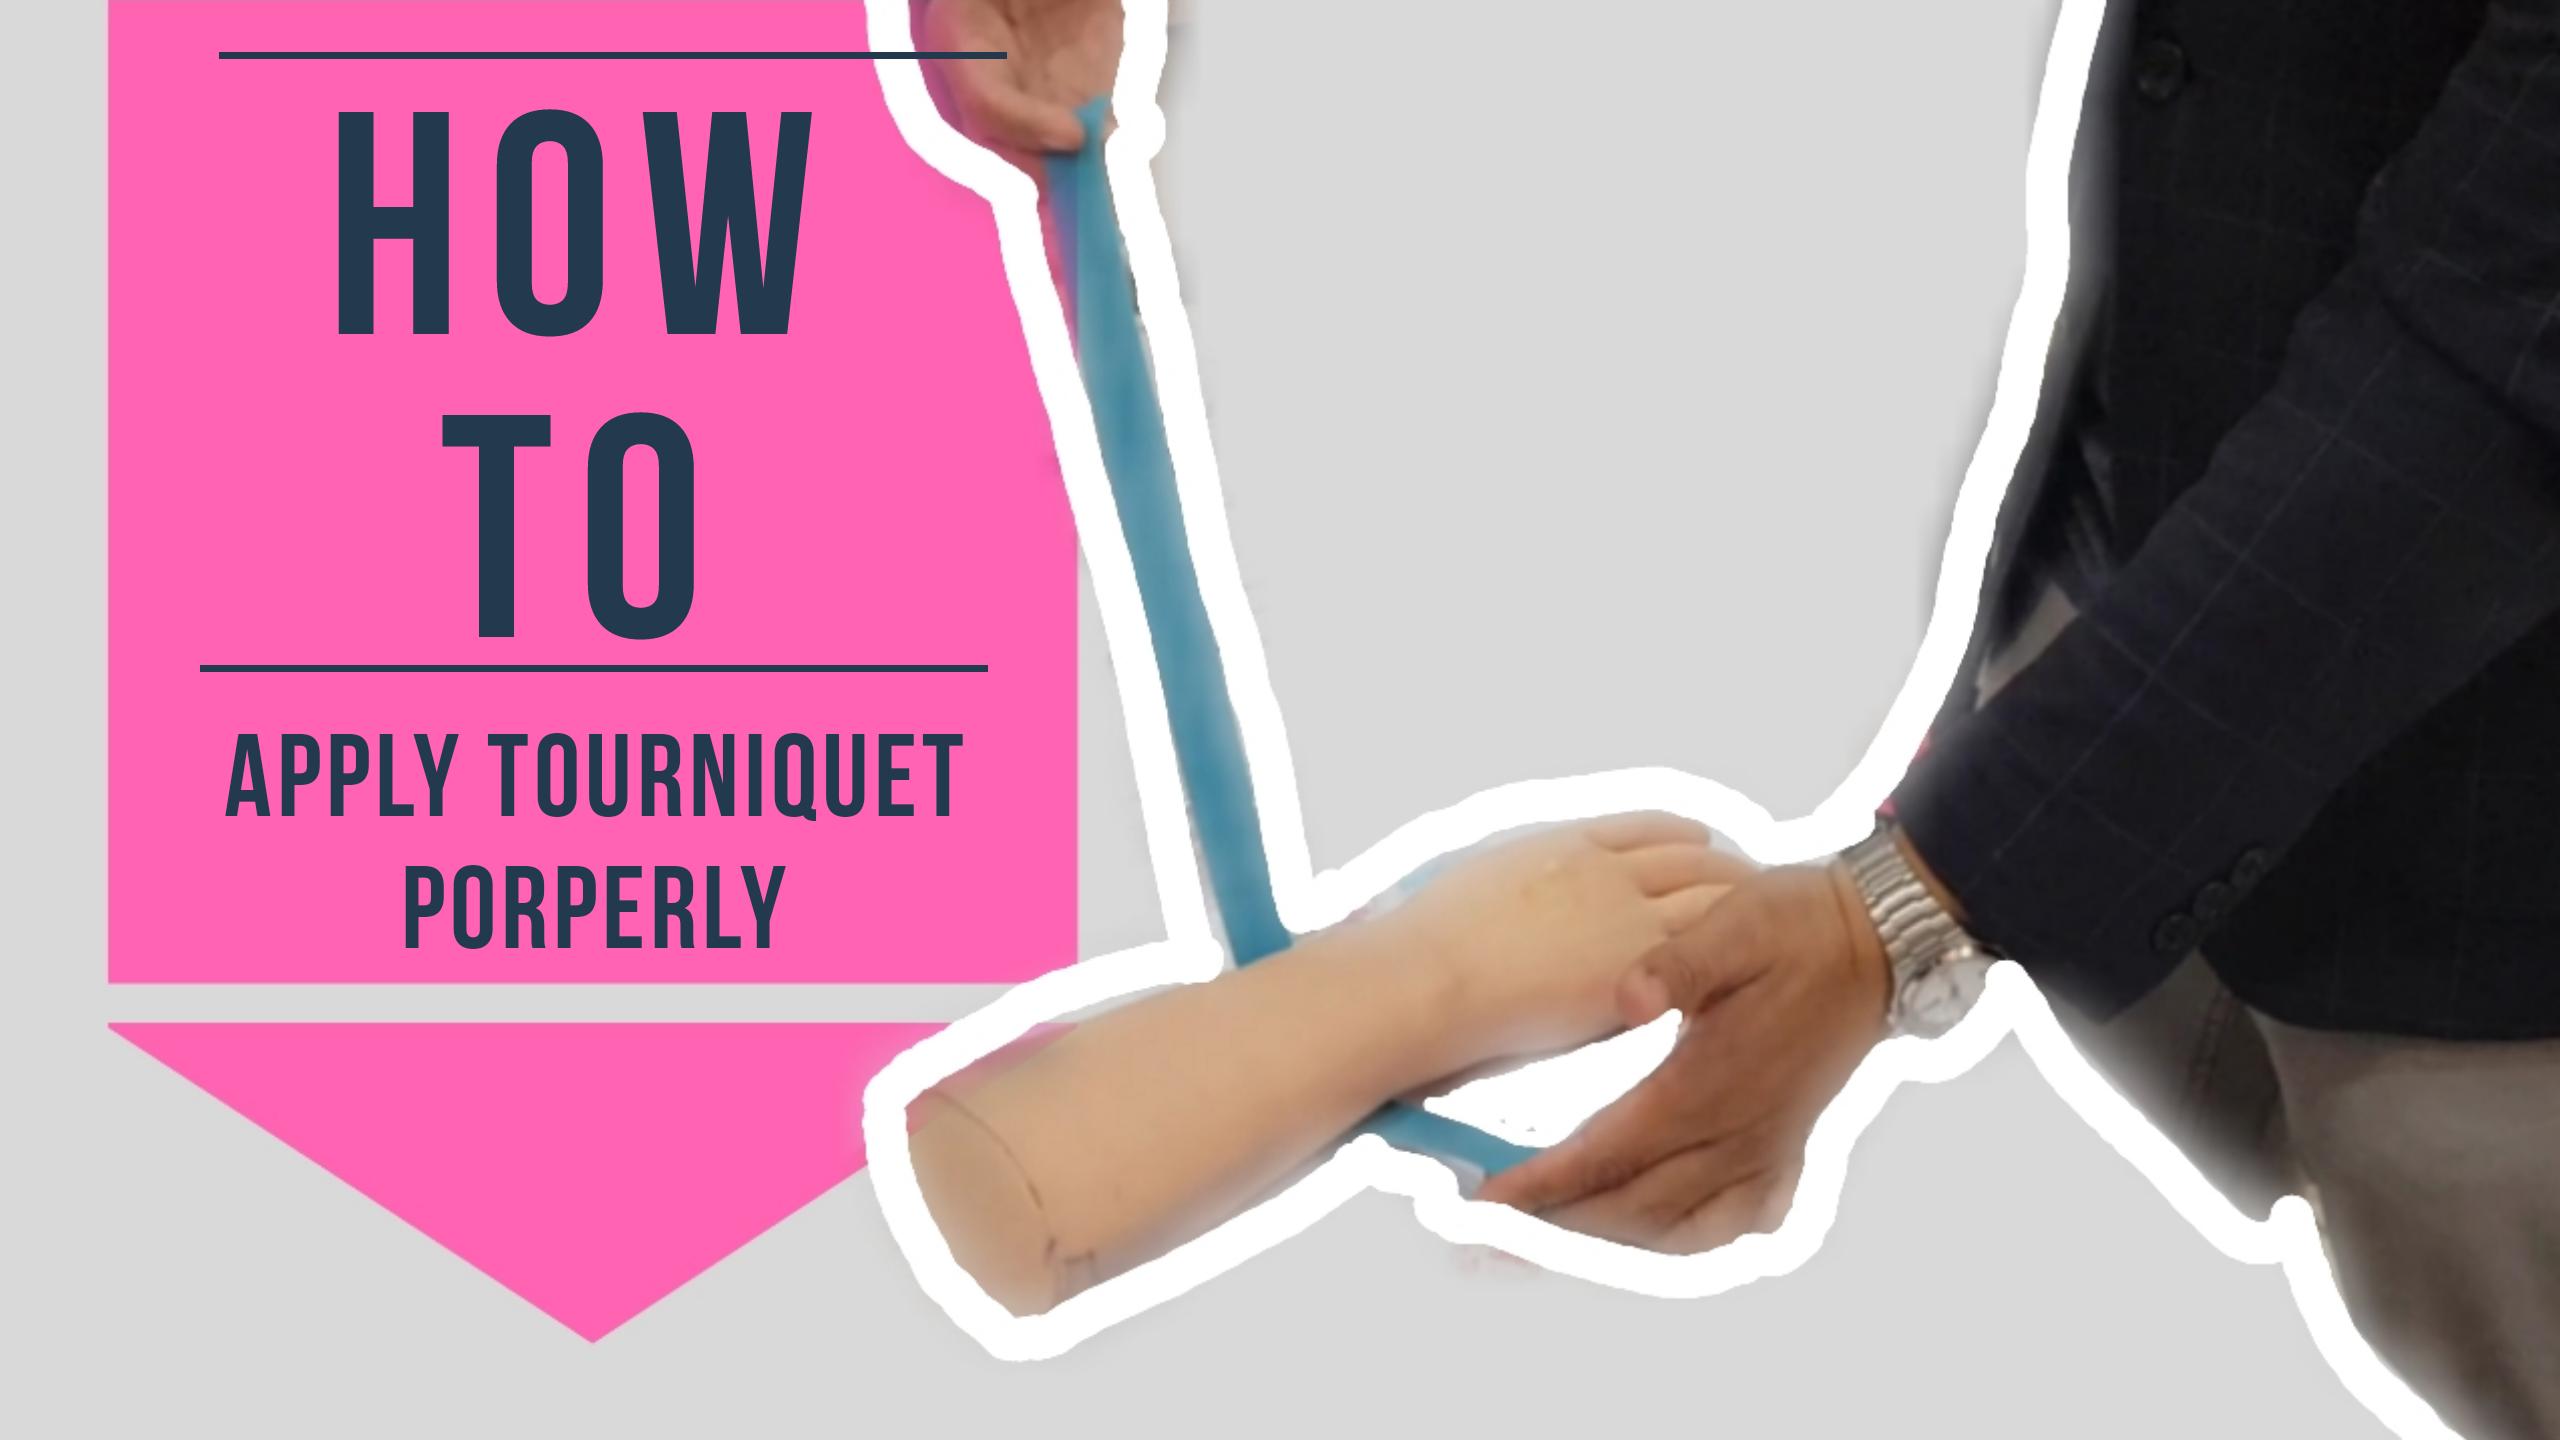 How To Apply Tourniquet Properly For Nurses